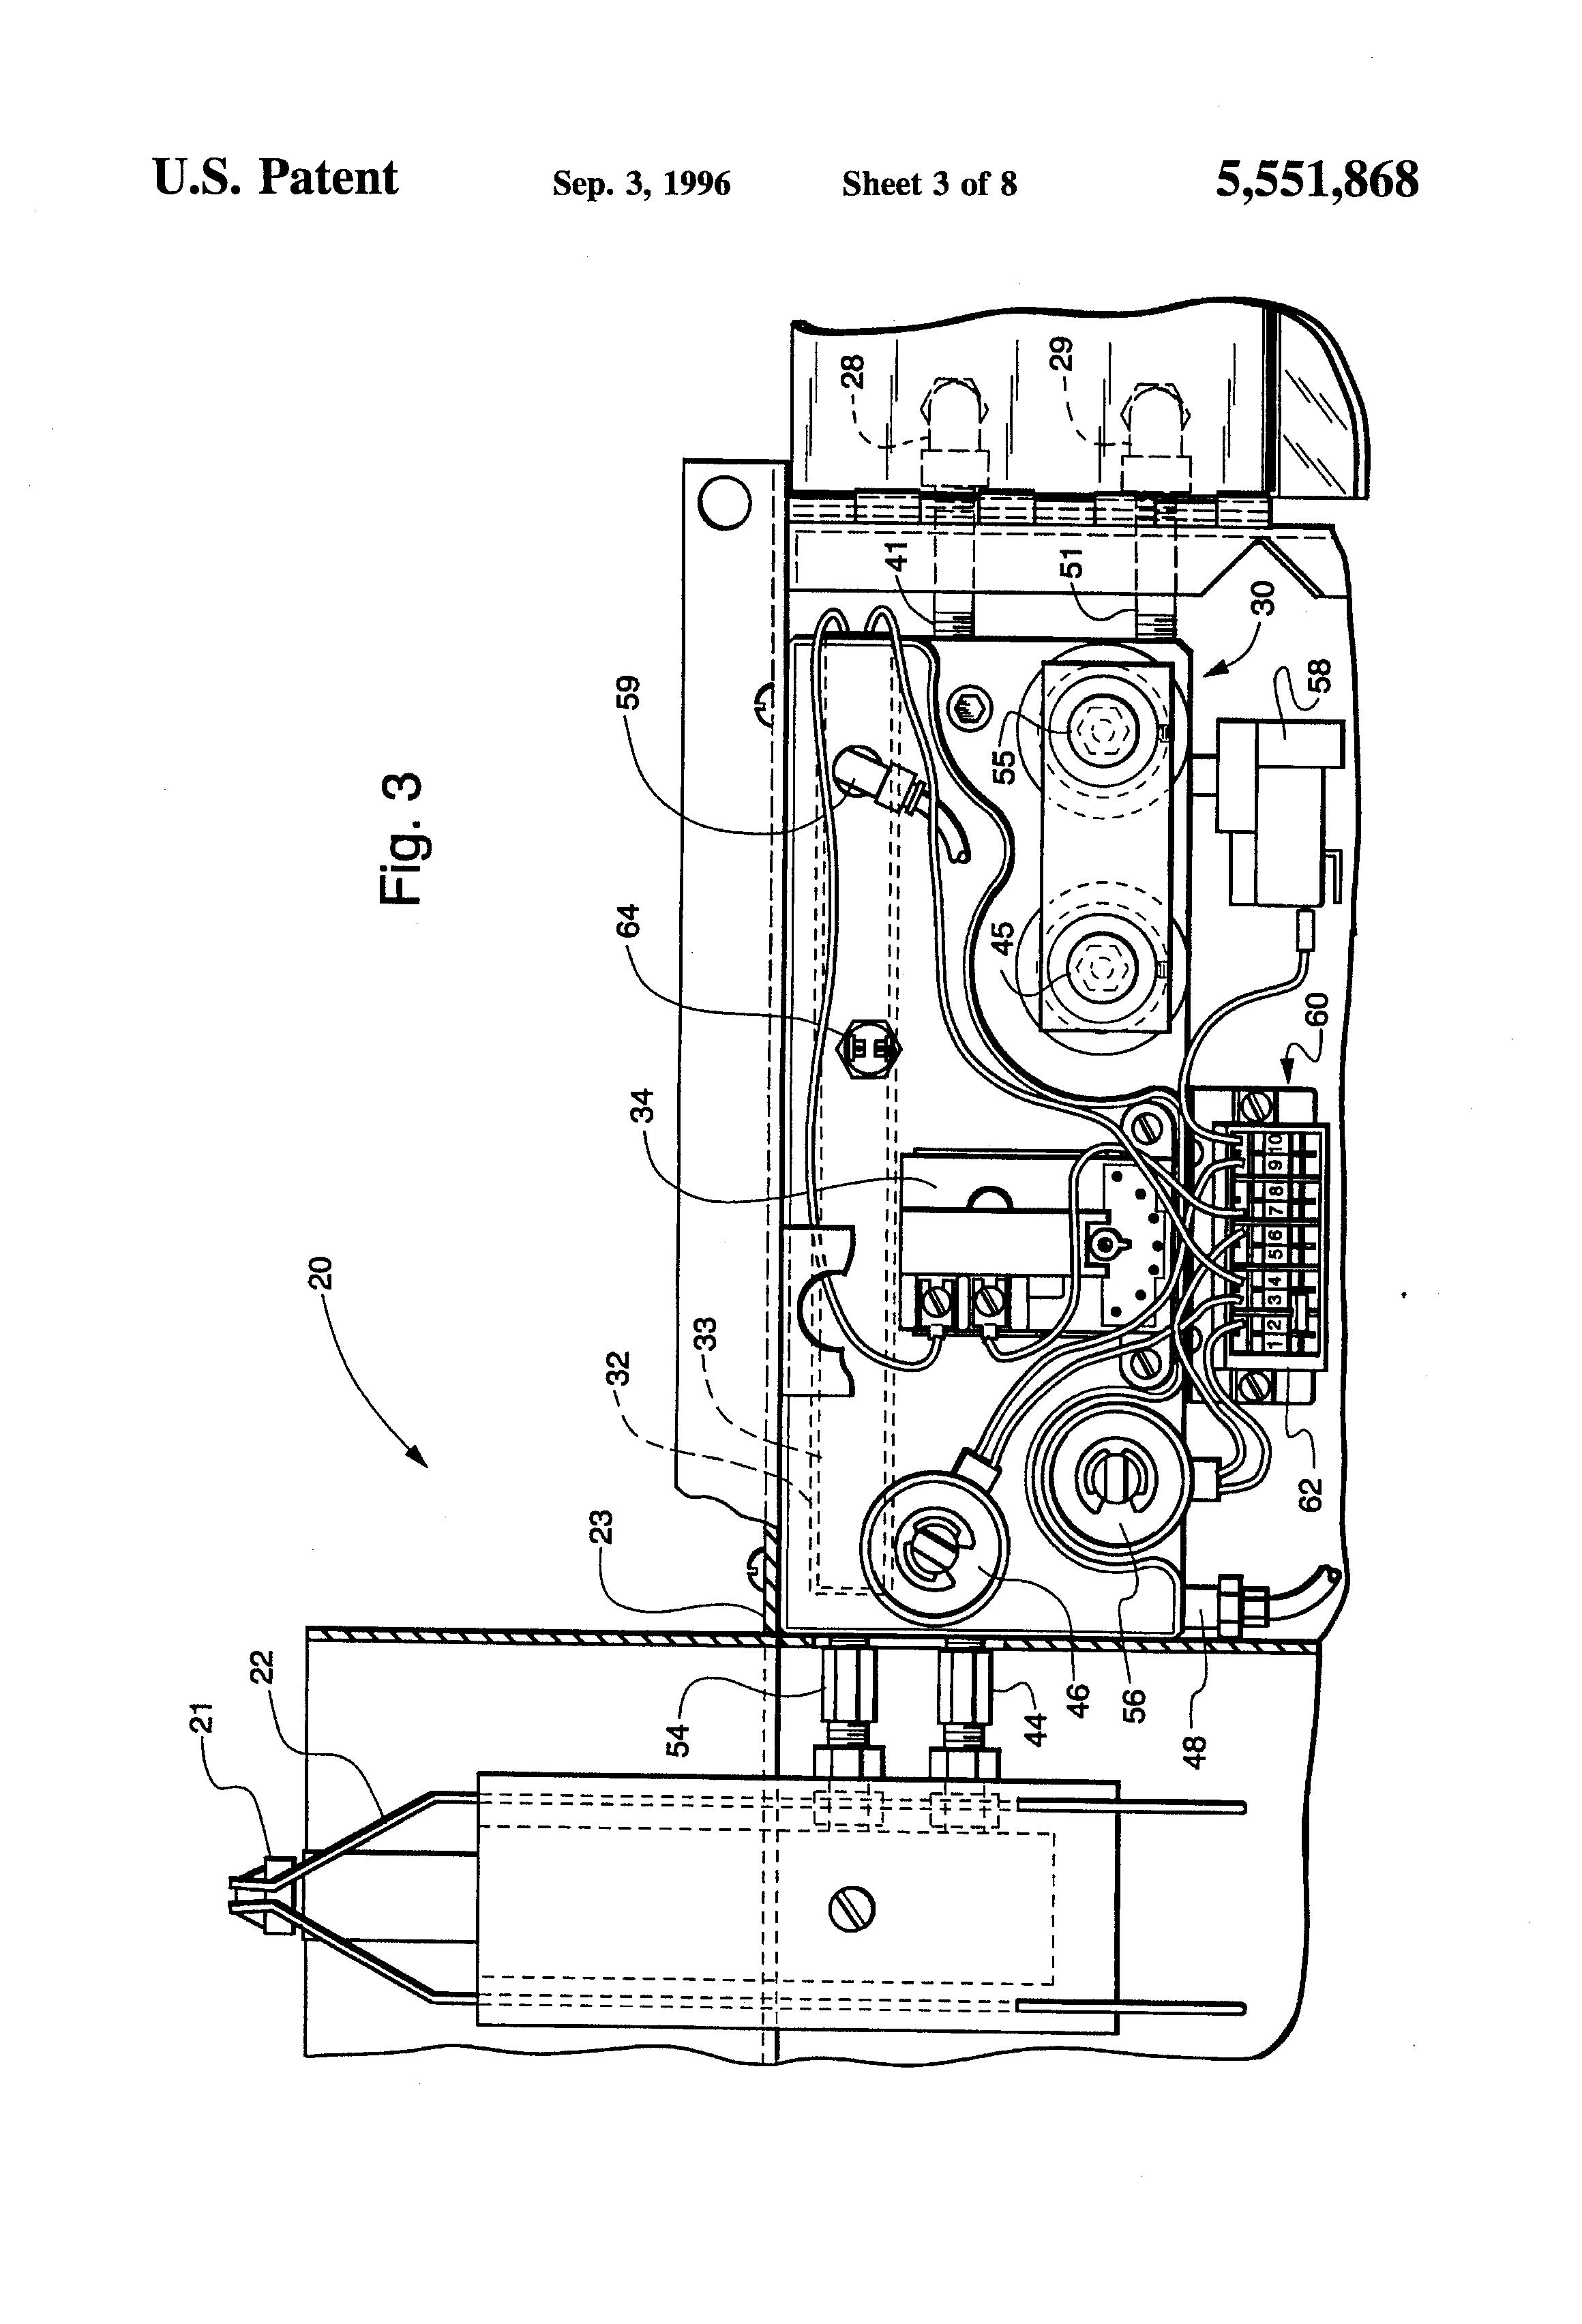 Janitrol Furnace Thermostat Wiring Diagram on